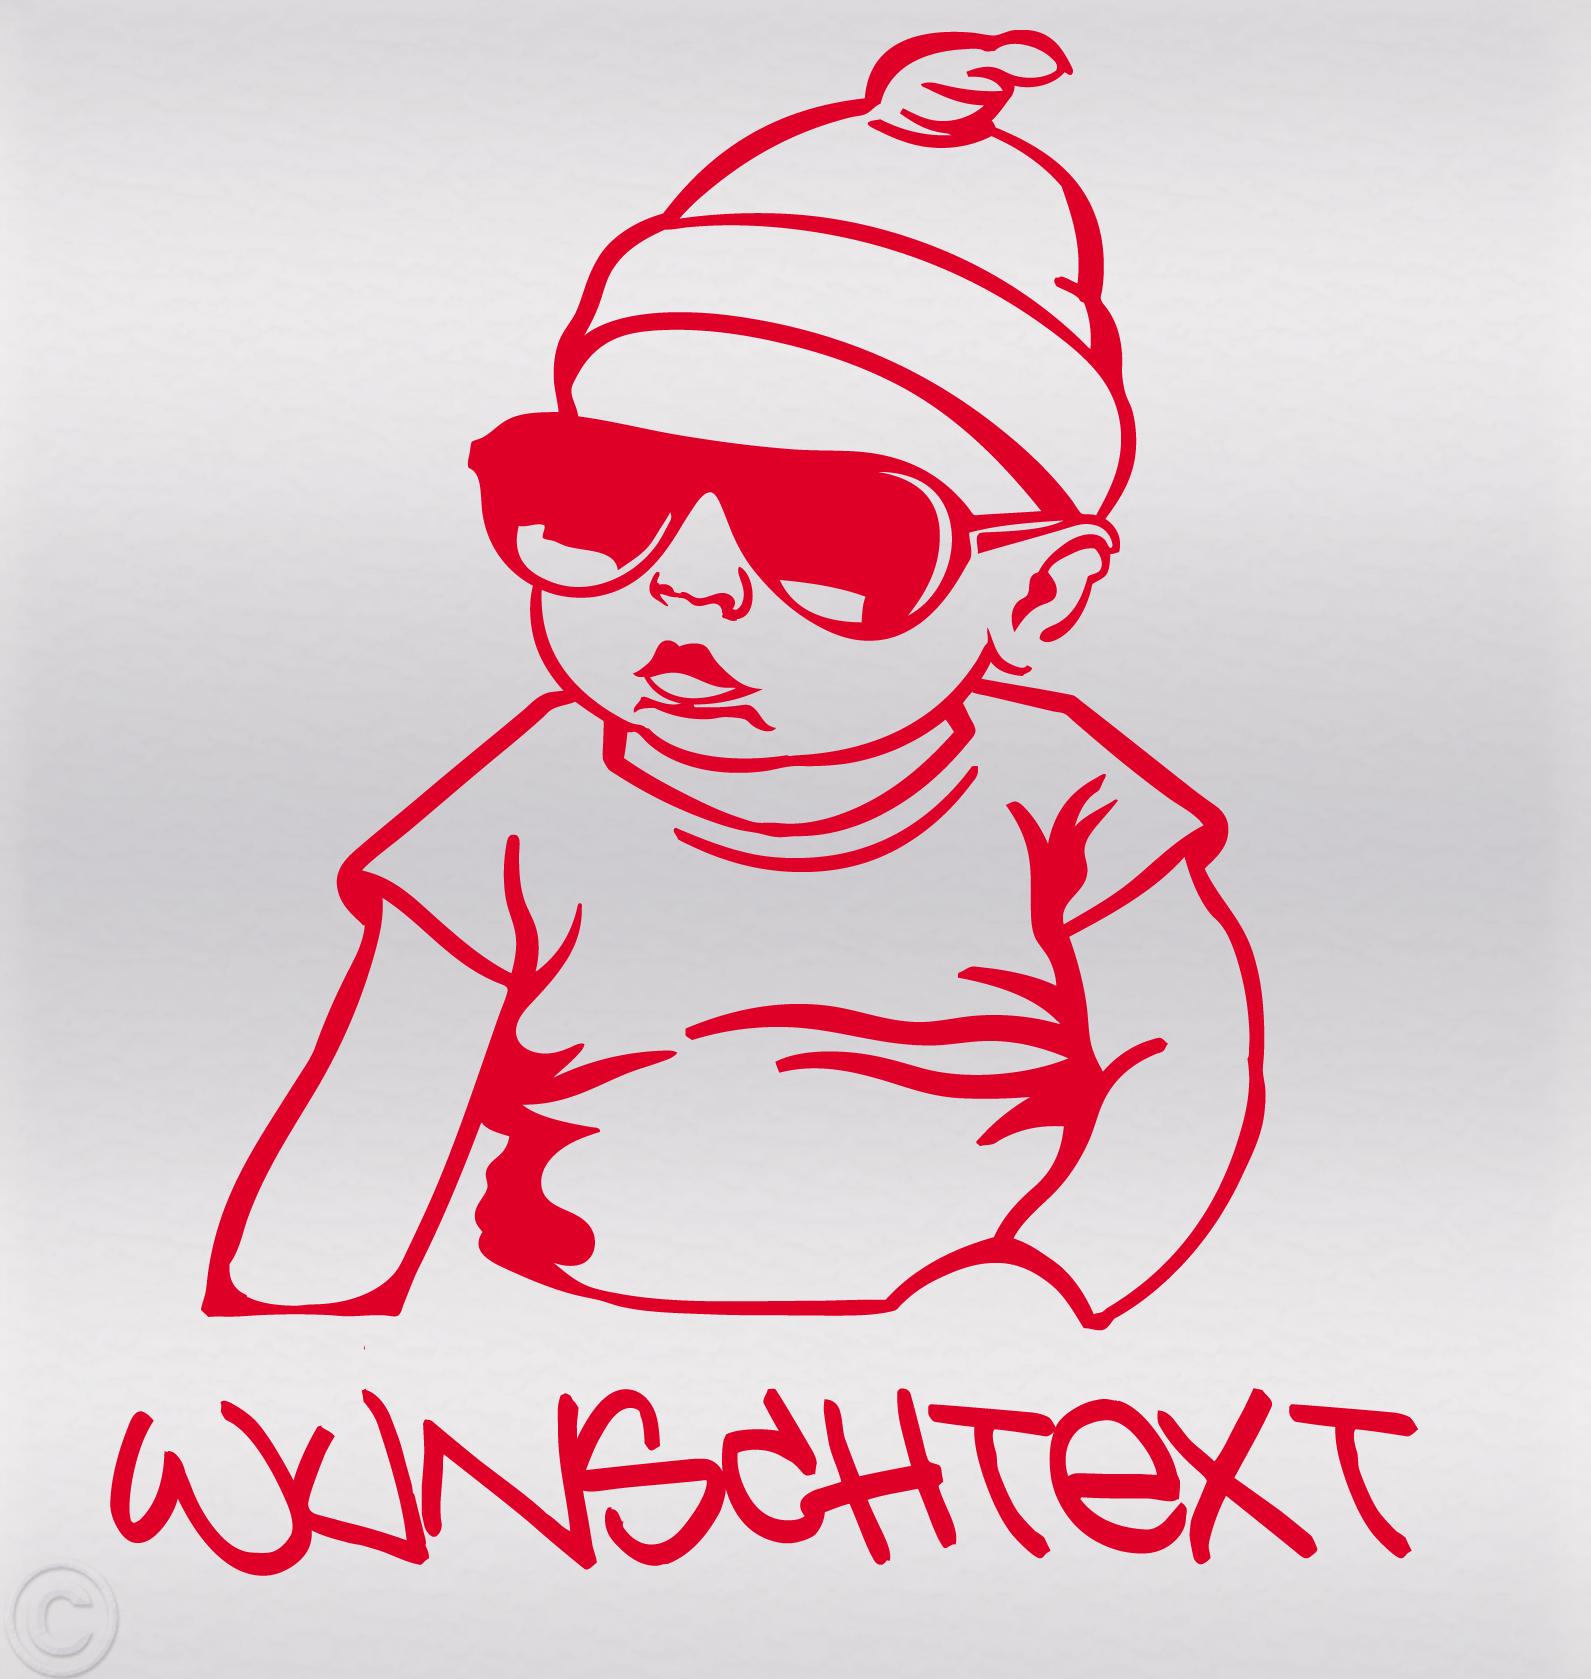 Hangover Babyaufkleber Wunschtext Mit Vorschau Gestalten